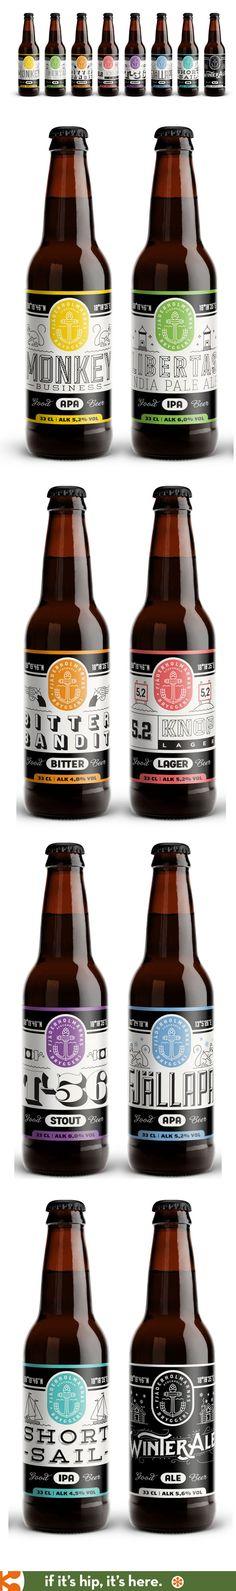 All the fabulous label designs for Fjäderholmarnas Beers.